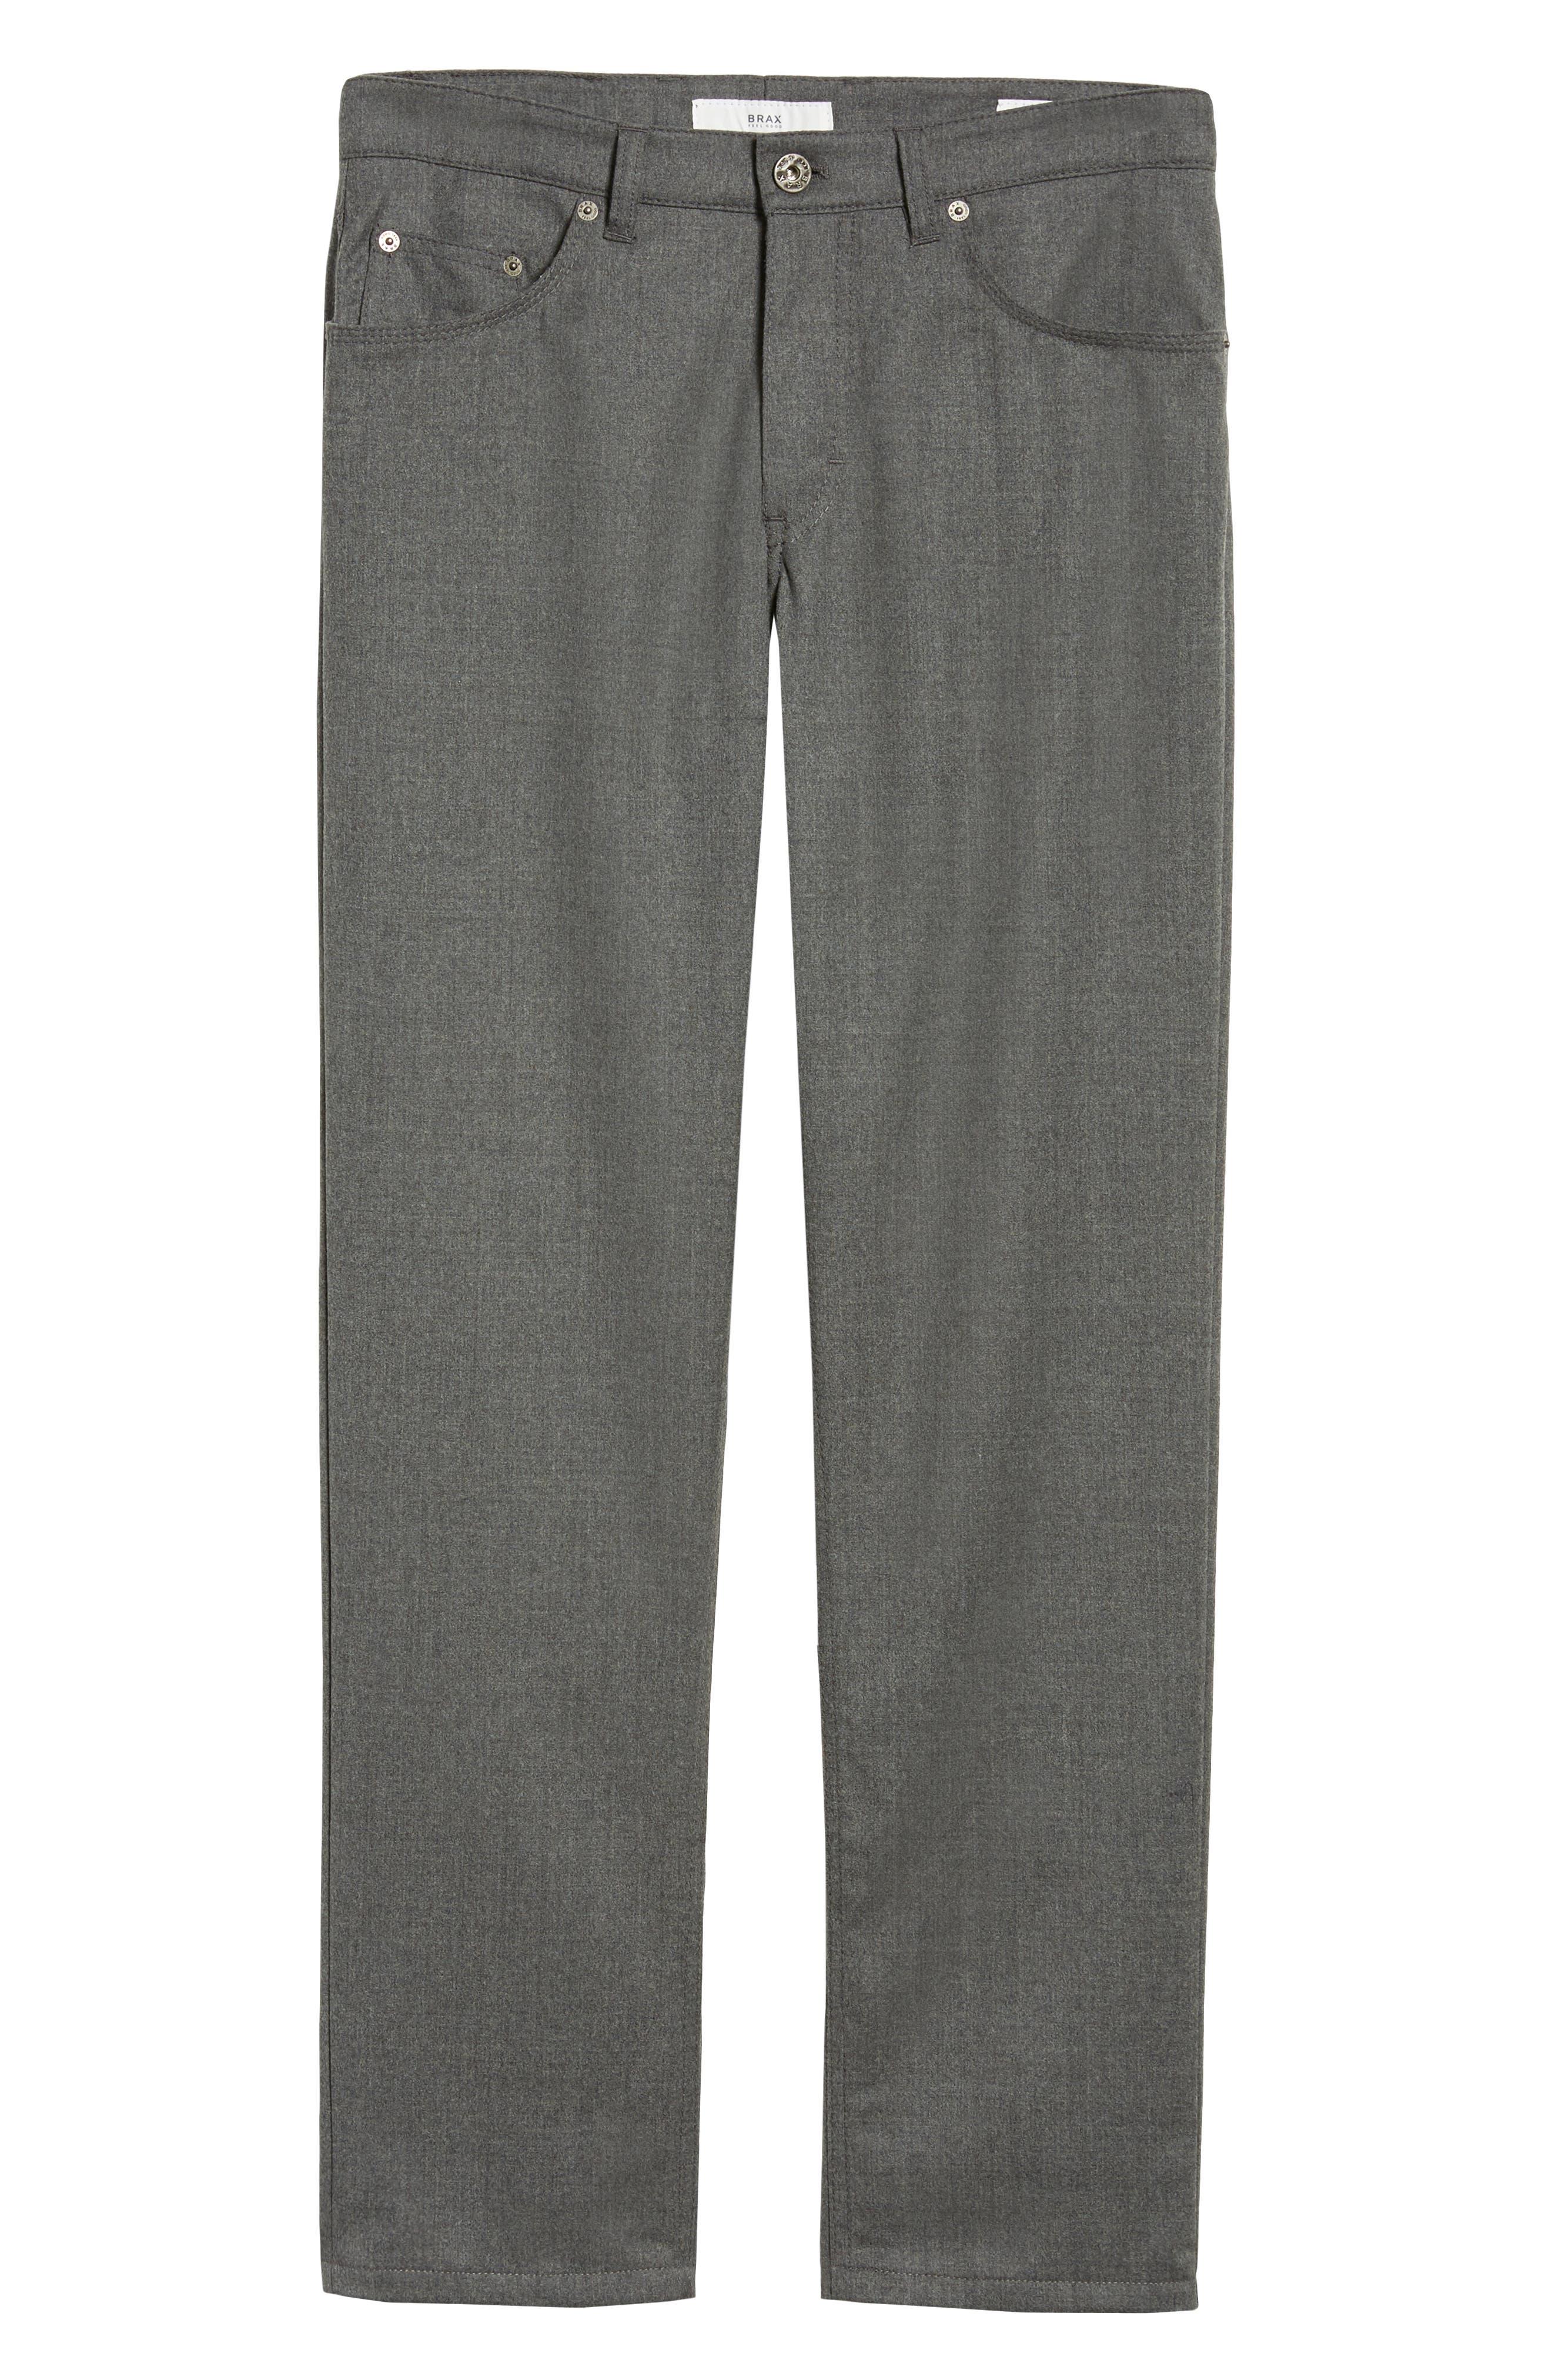 Enrico Five-Pocket Stretch Wool Trousers,                             Alternate thumbnail 6, color,                             GRAPHITE